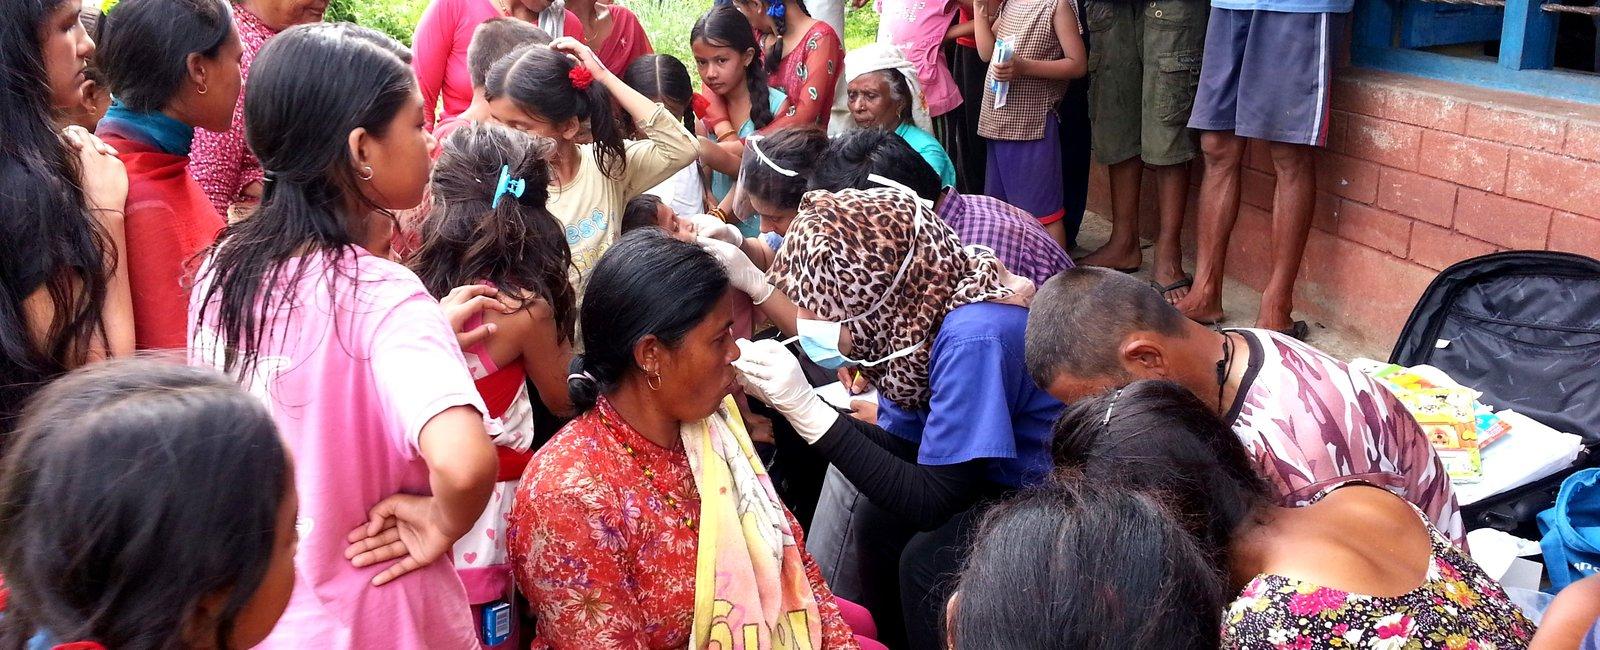 Avan Mohammed - Dentistry Electives in Nepal Pokhara